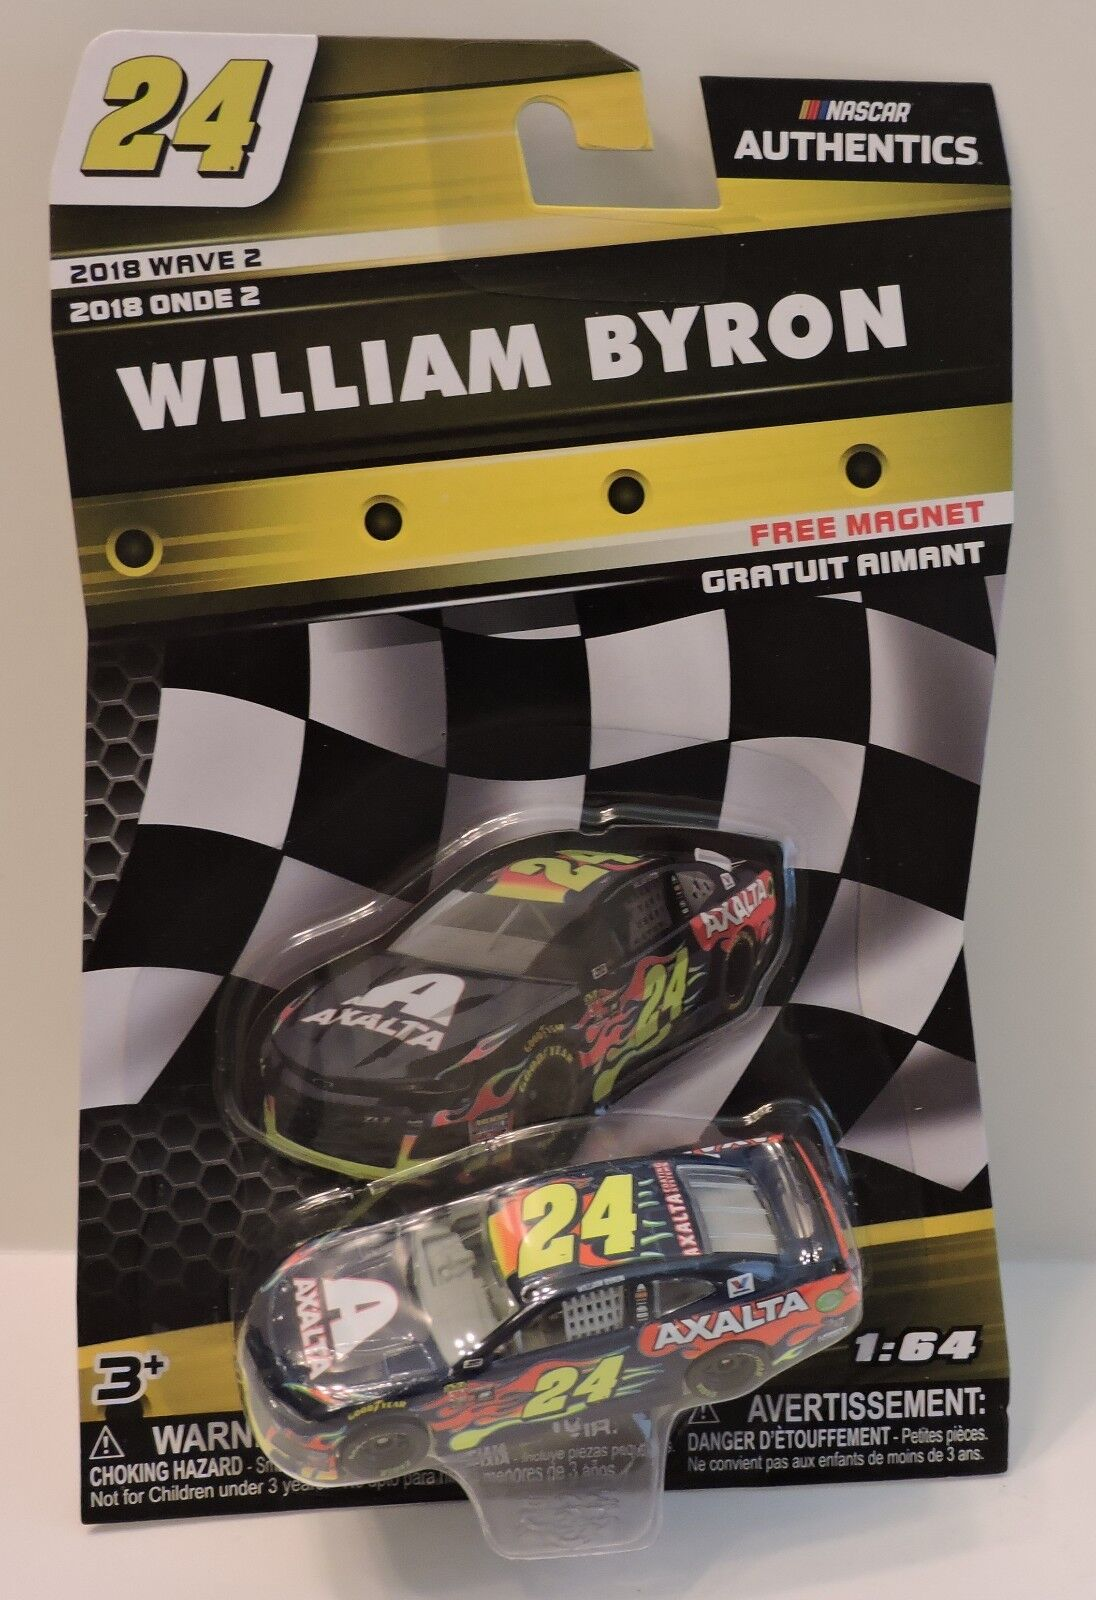 2018 WILLIAM BYRON #24 AXALTA NASCAR AUTHENTICS 1:64 W/#24 A